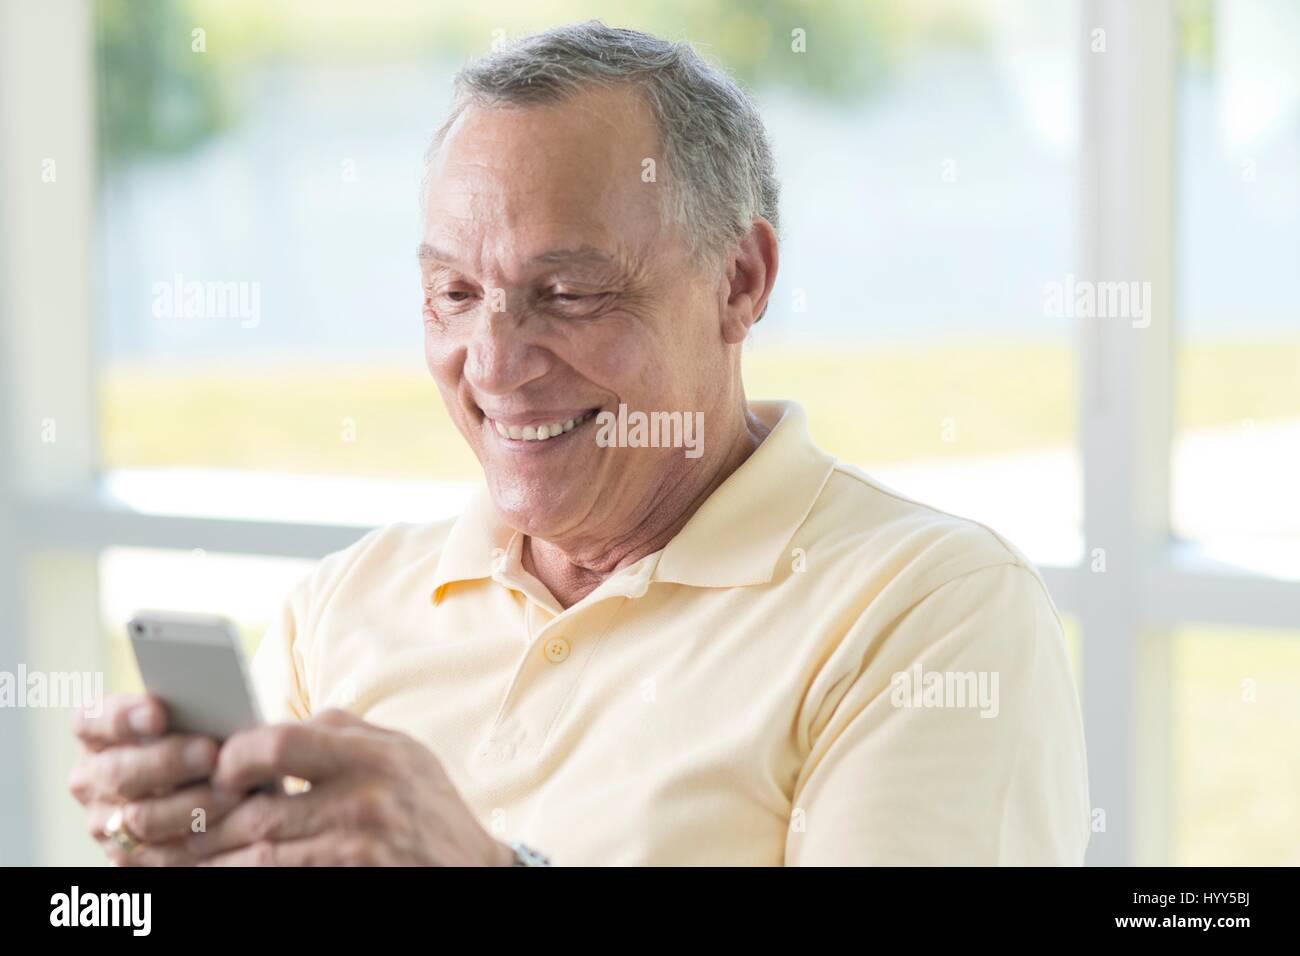 Senior man using cell phone. - Stock Image